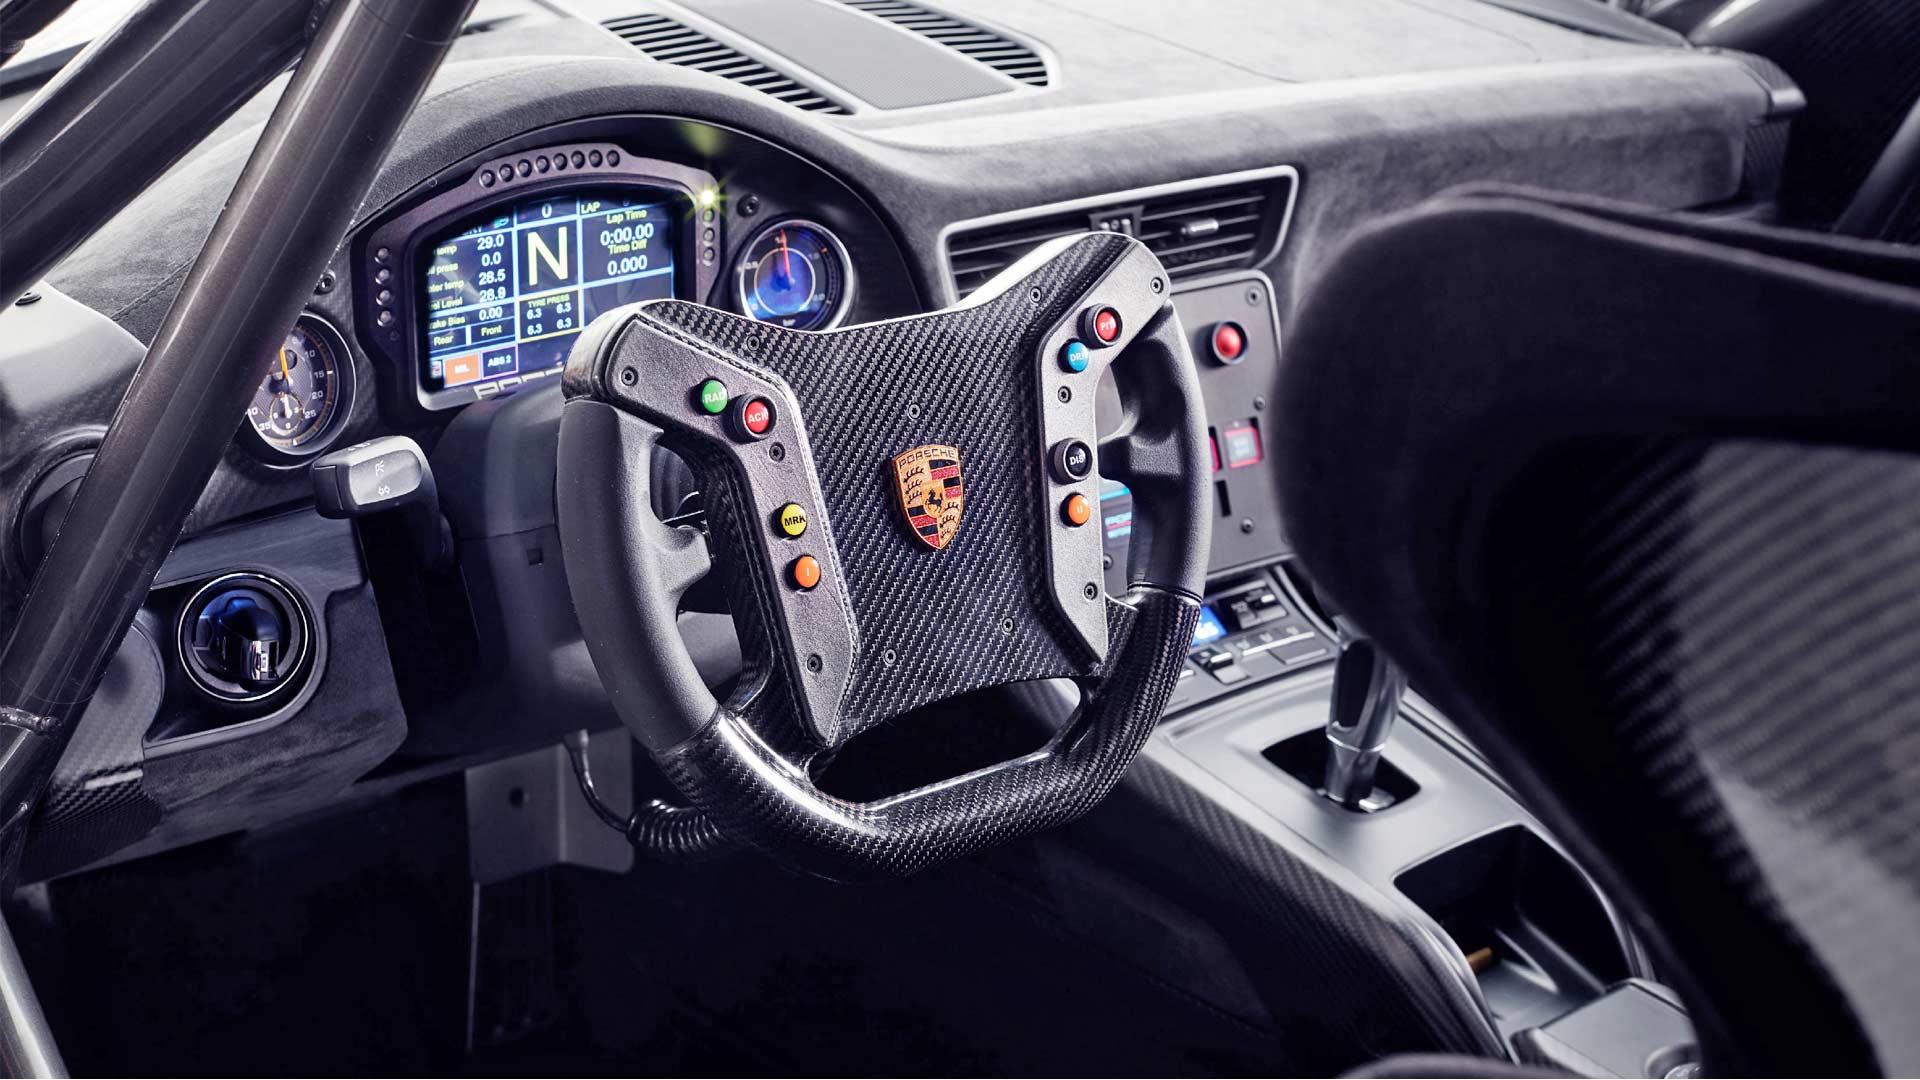 Porsche 935 Race Car Returns For Old Times Sake Autodevot